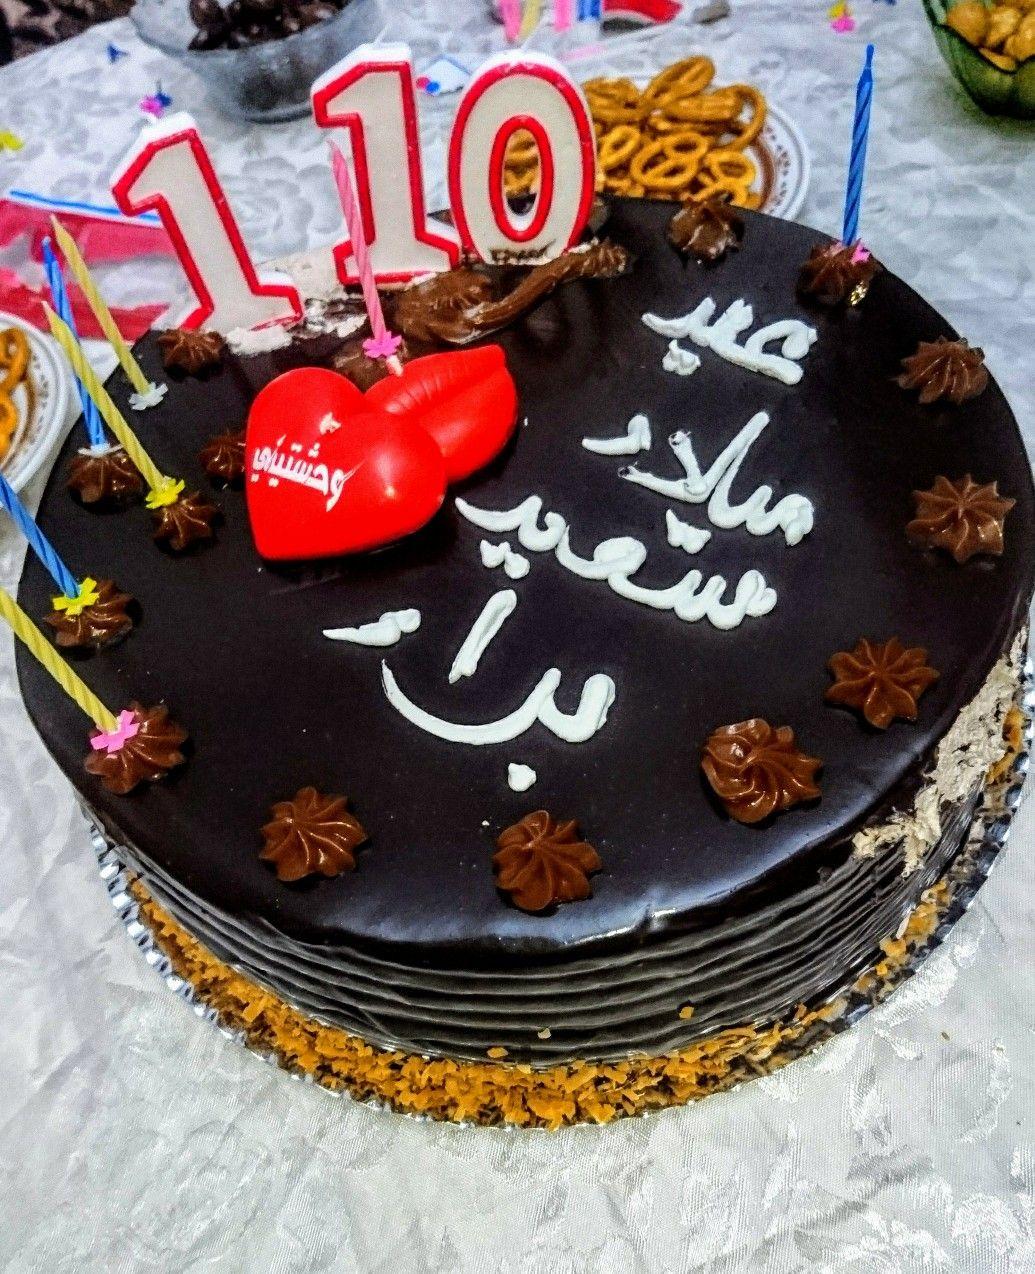 صور اسم سمية علي تورته عيد ميلاد سعيد Birthday Cake Writing Happy Birthday Cakes Online Birthday Cake